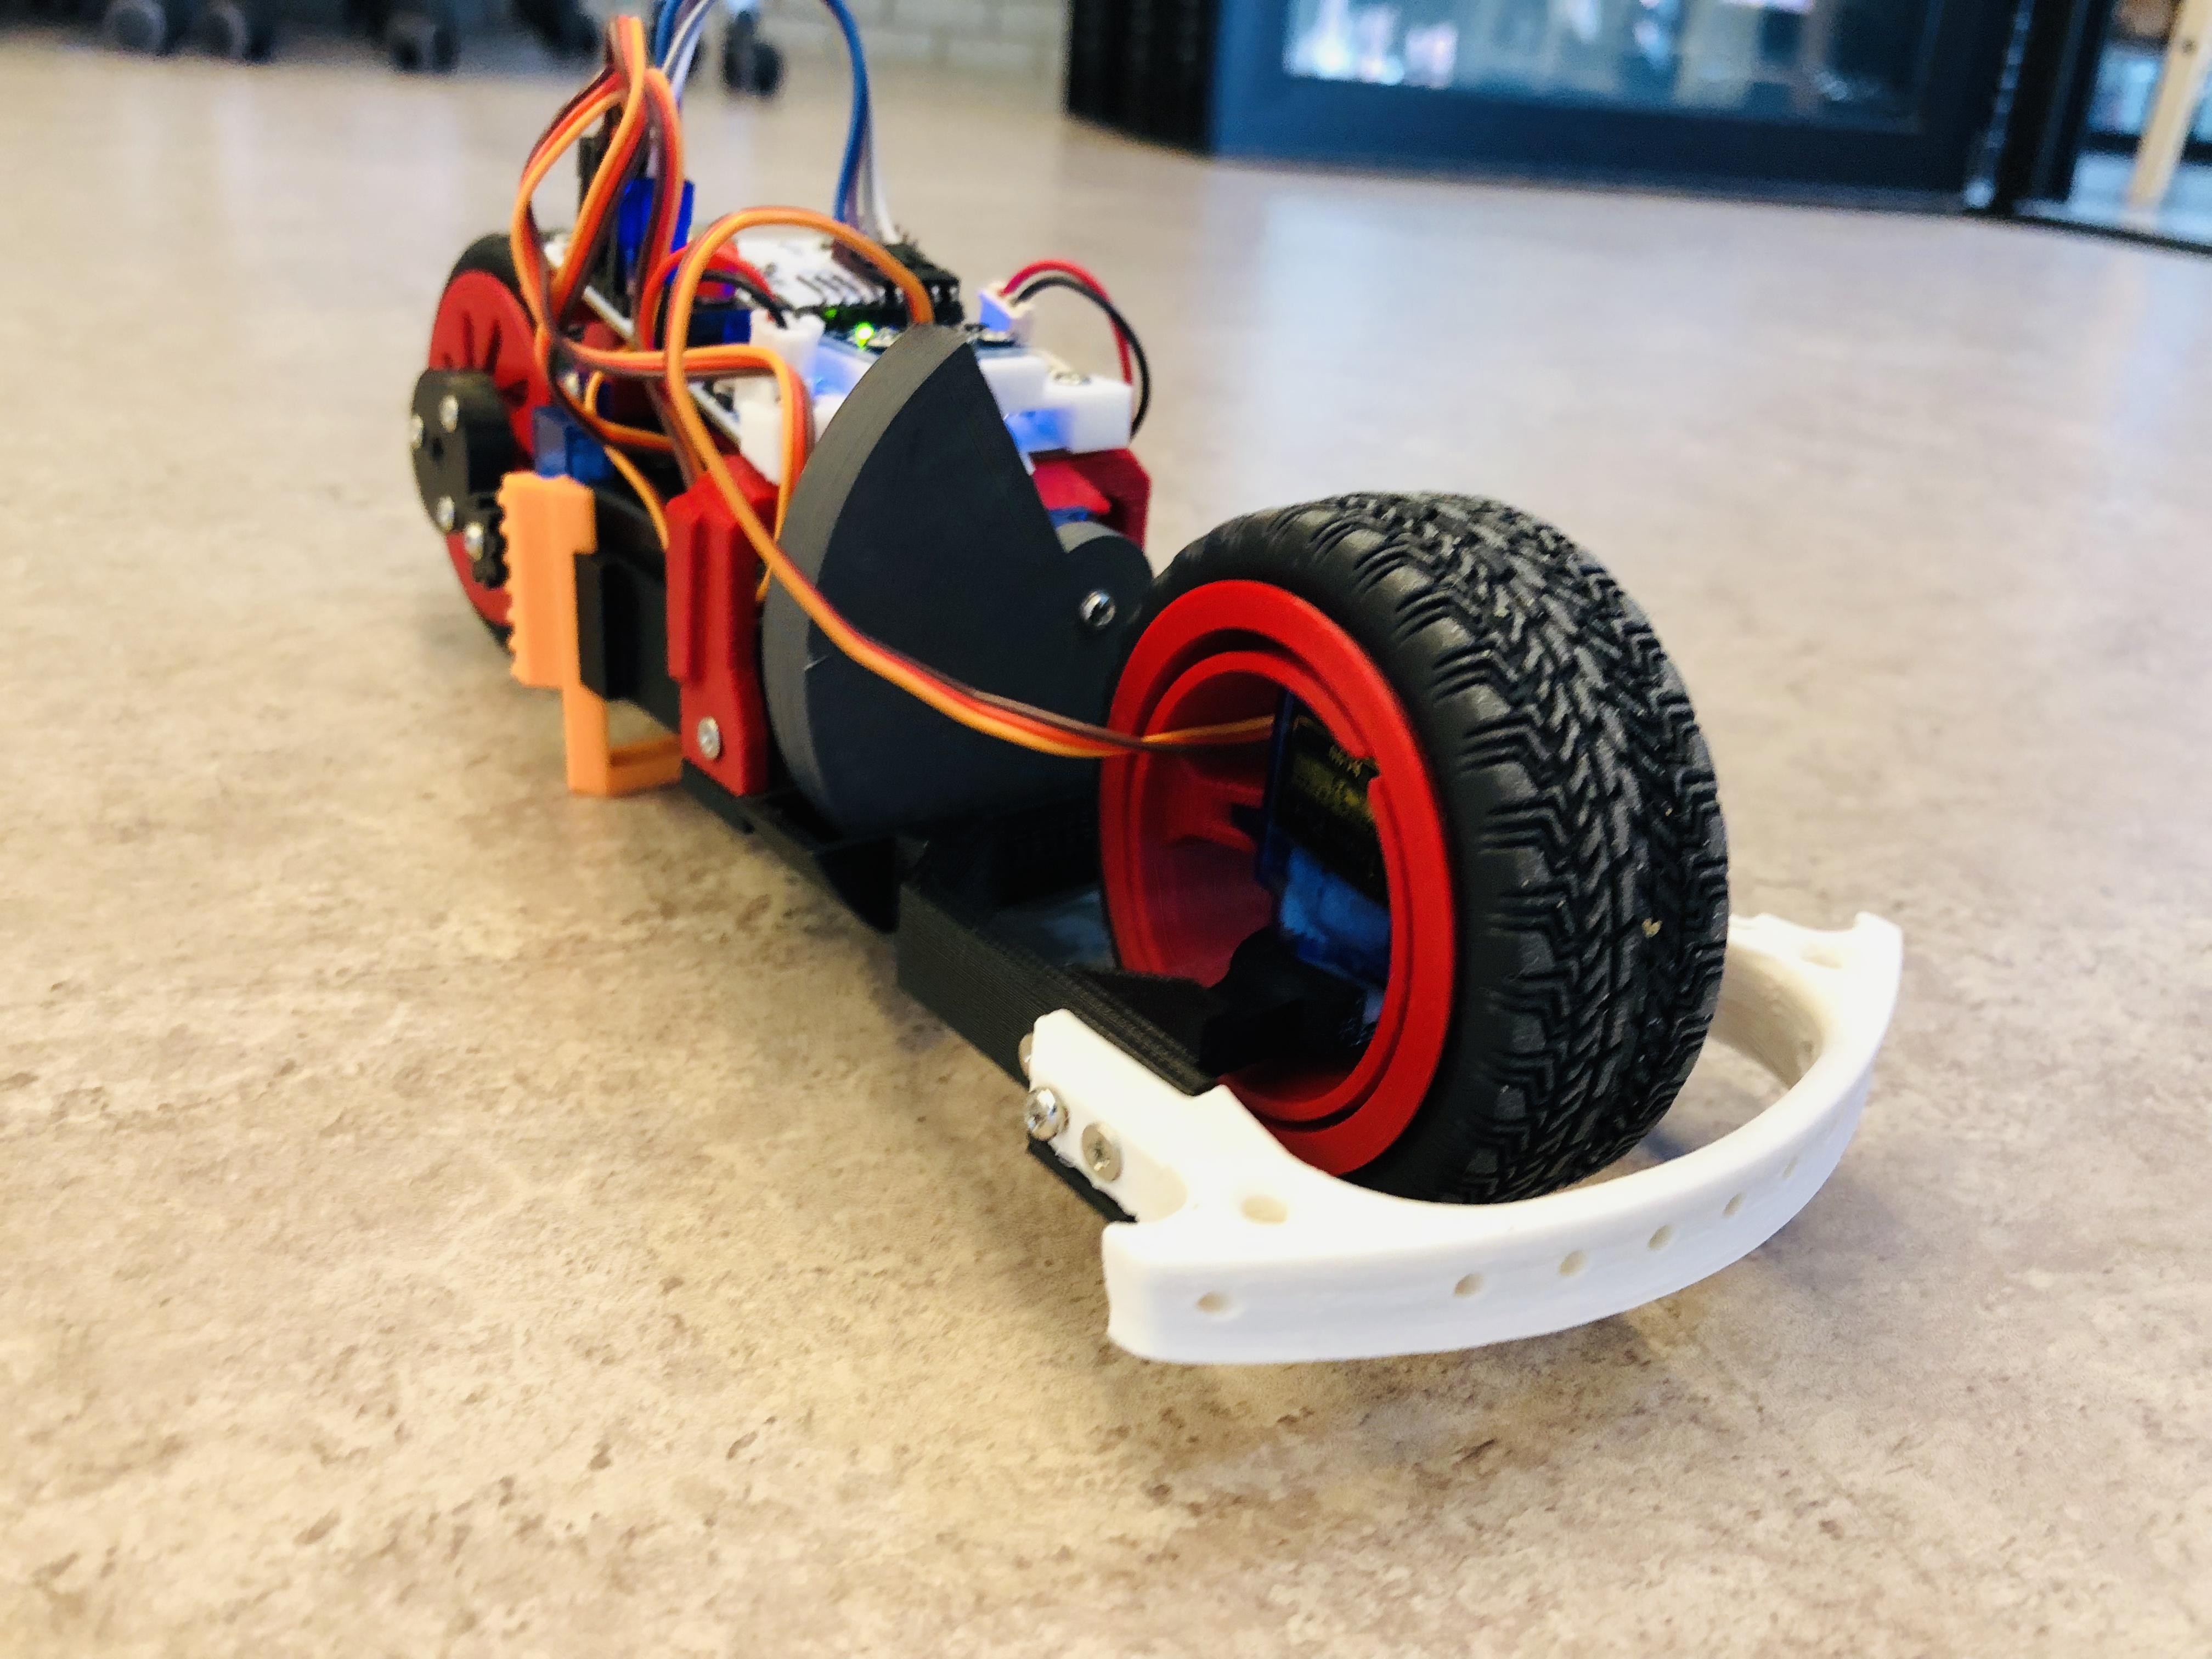 3D프린팅과 아두이노를 활용 Balancing Bike 제작 - K-ICT 디바이스랩 판교